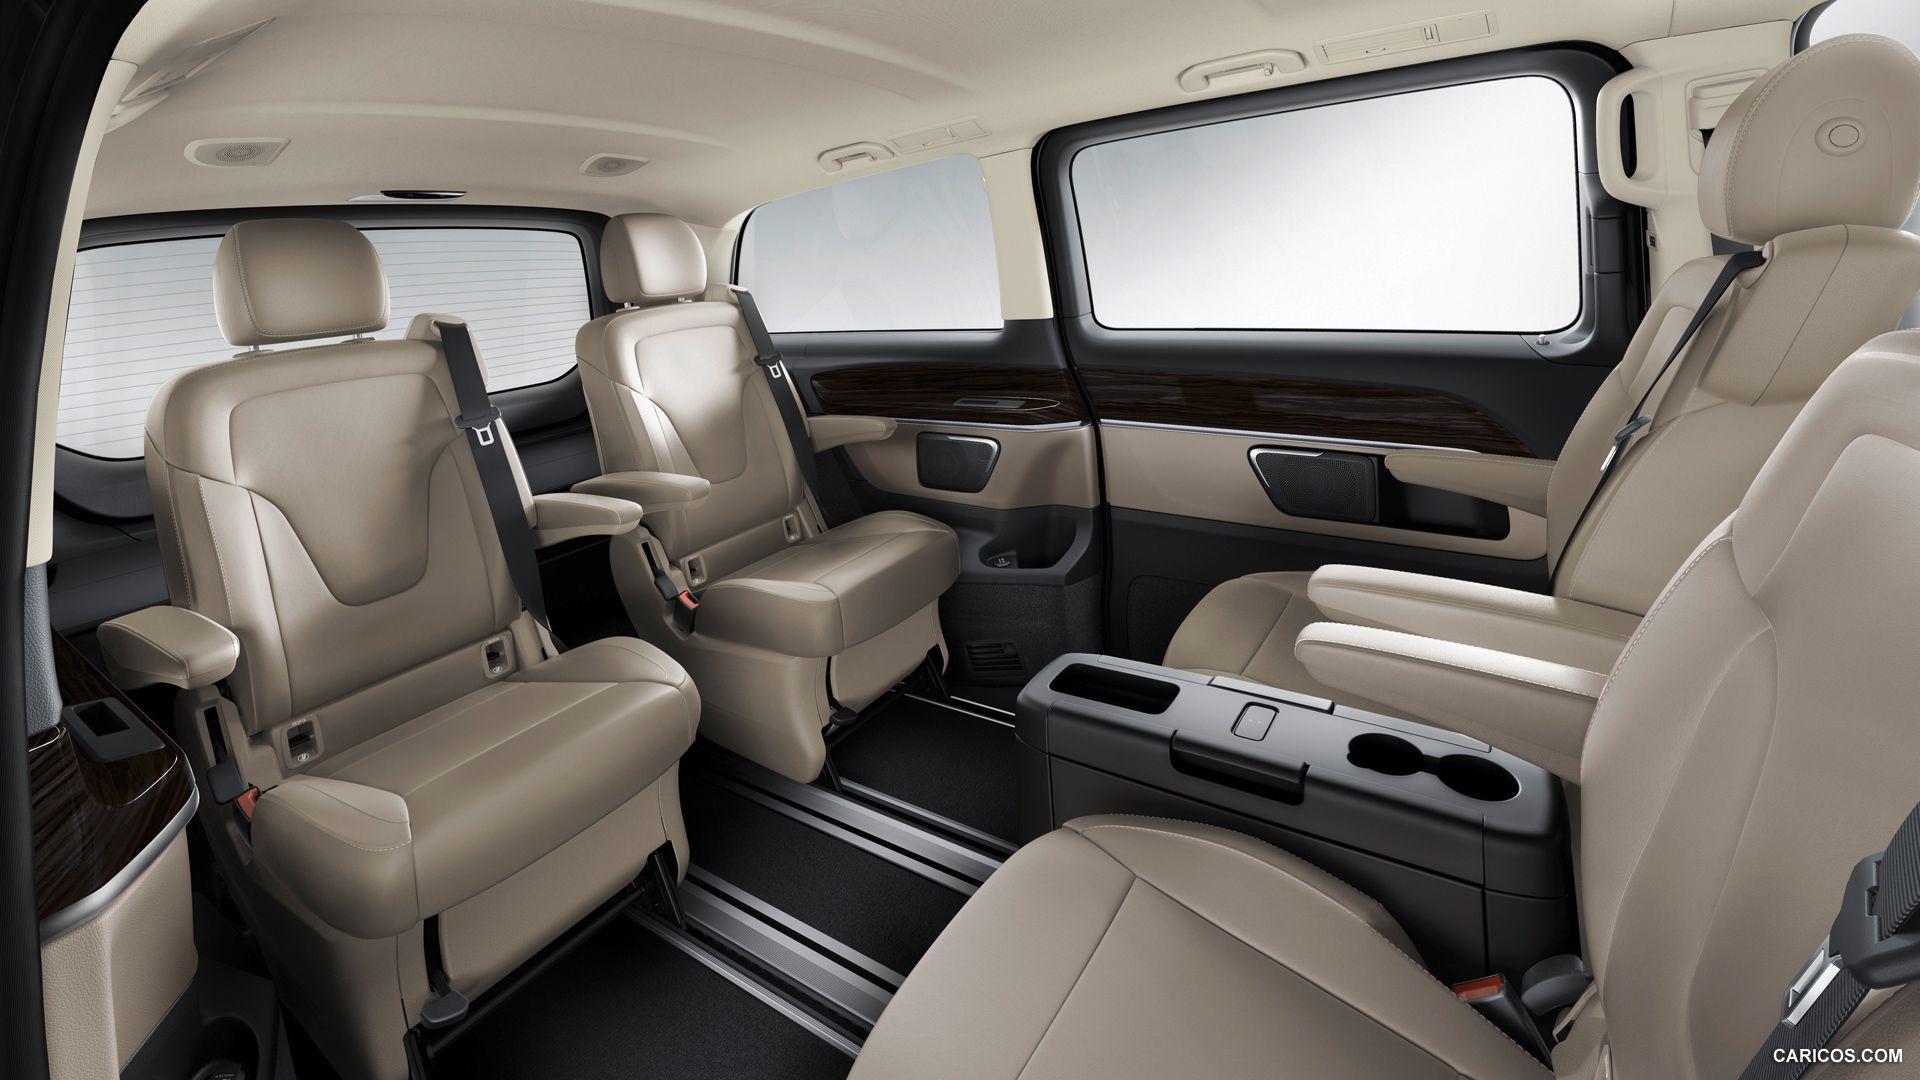 Business group glm vip limousine transfers mercedes benz viano minivan